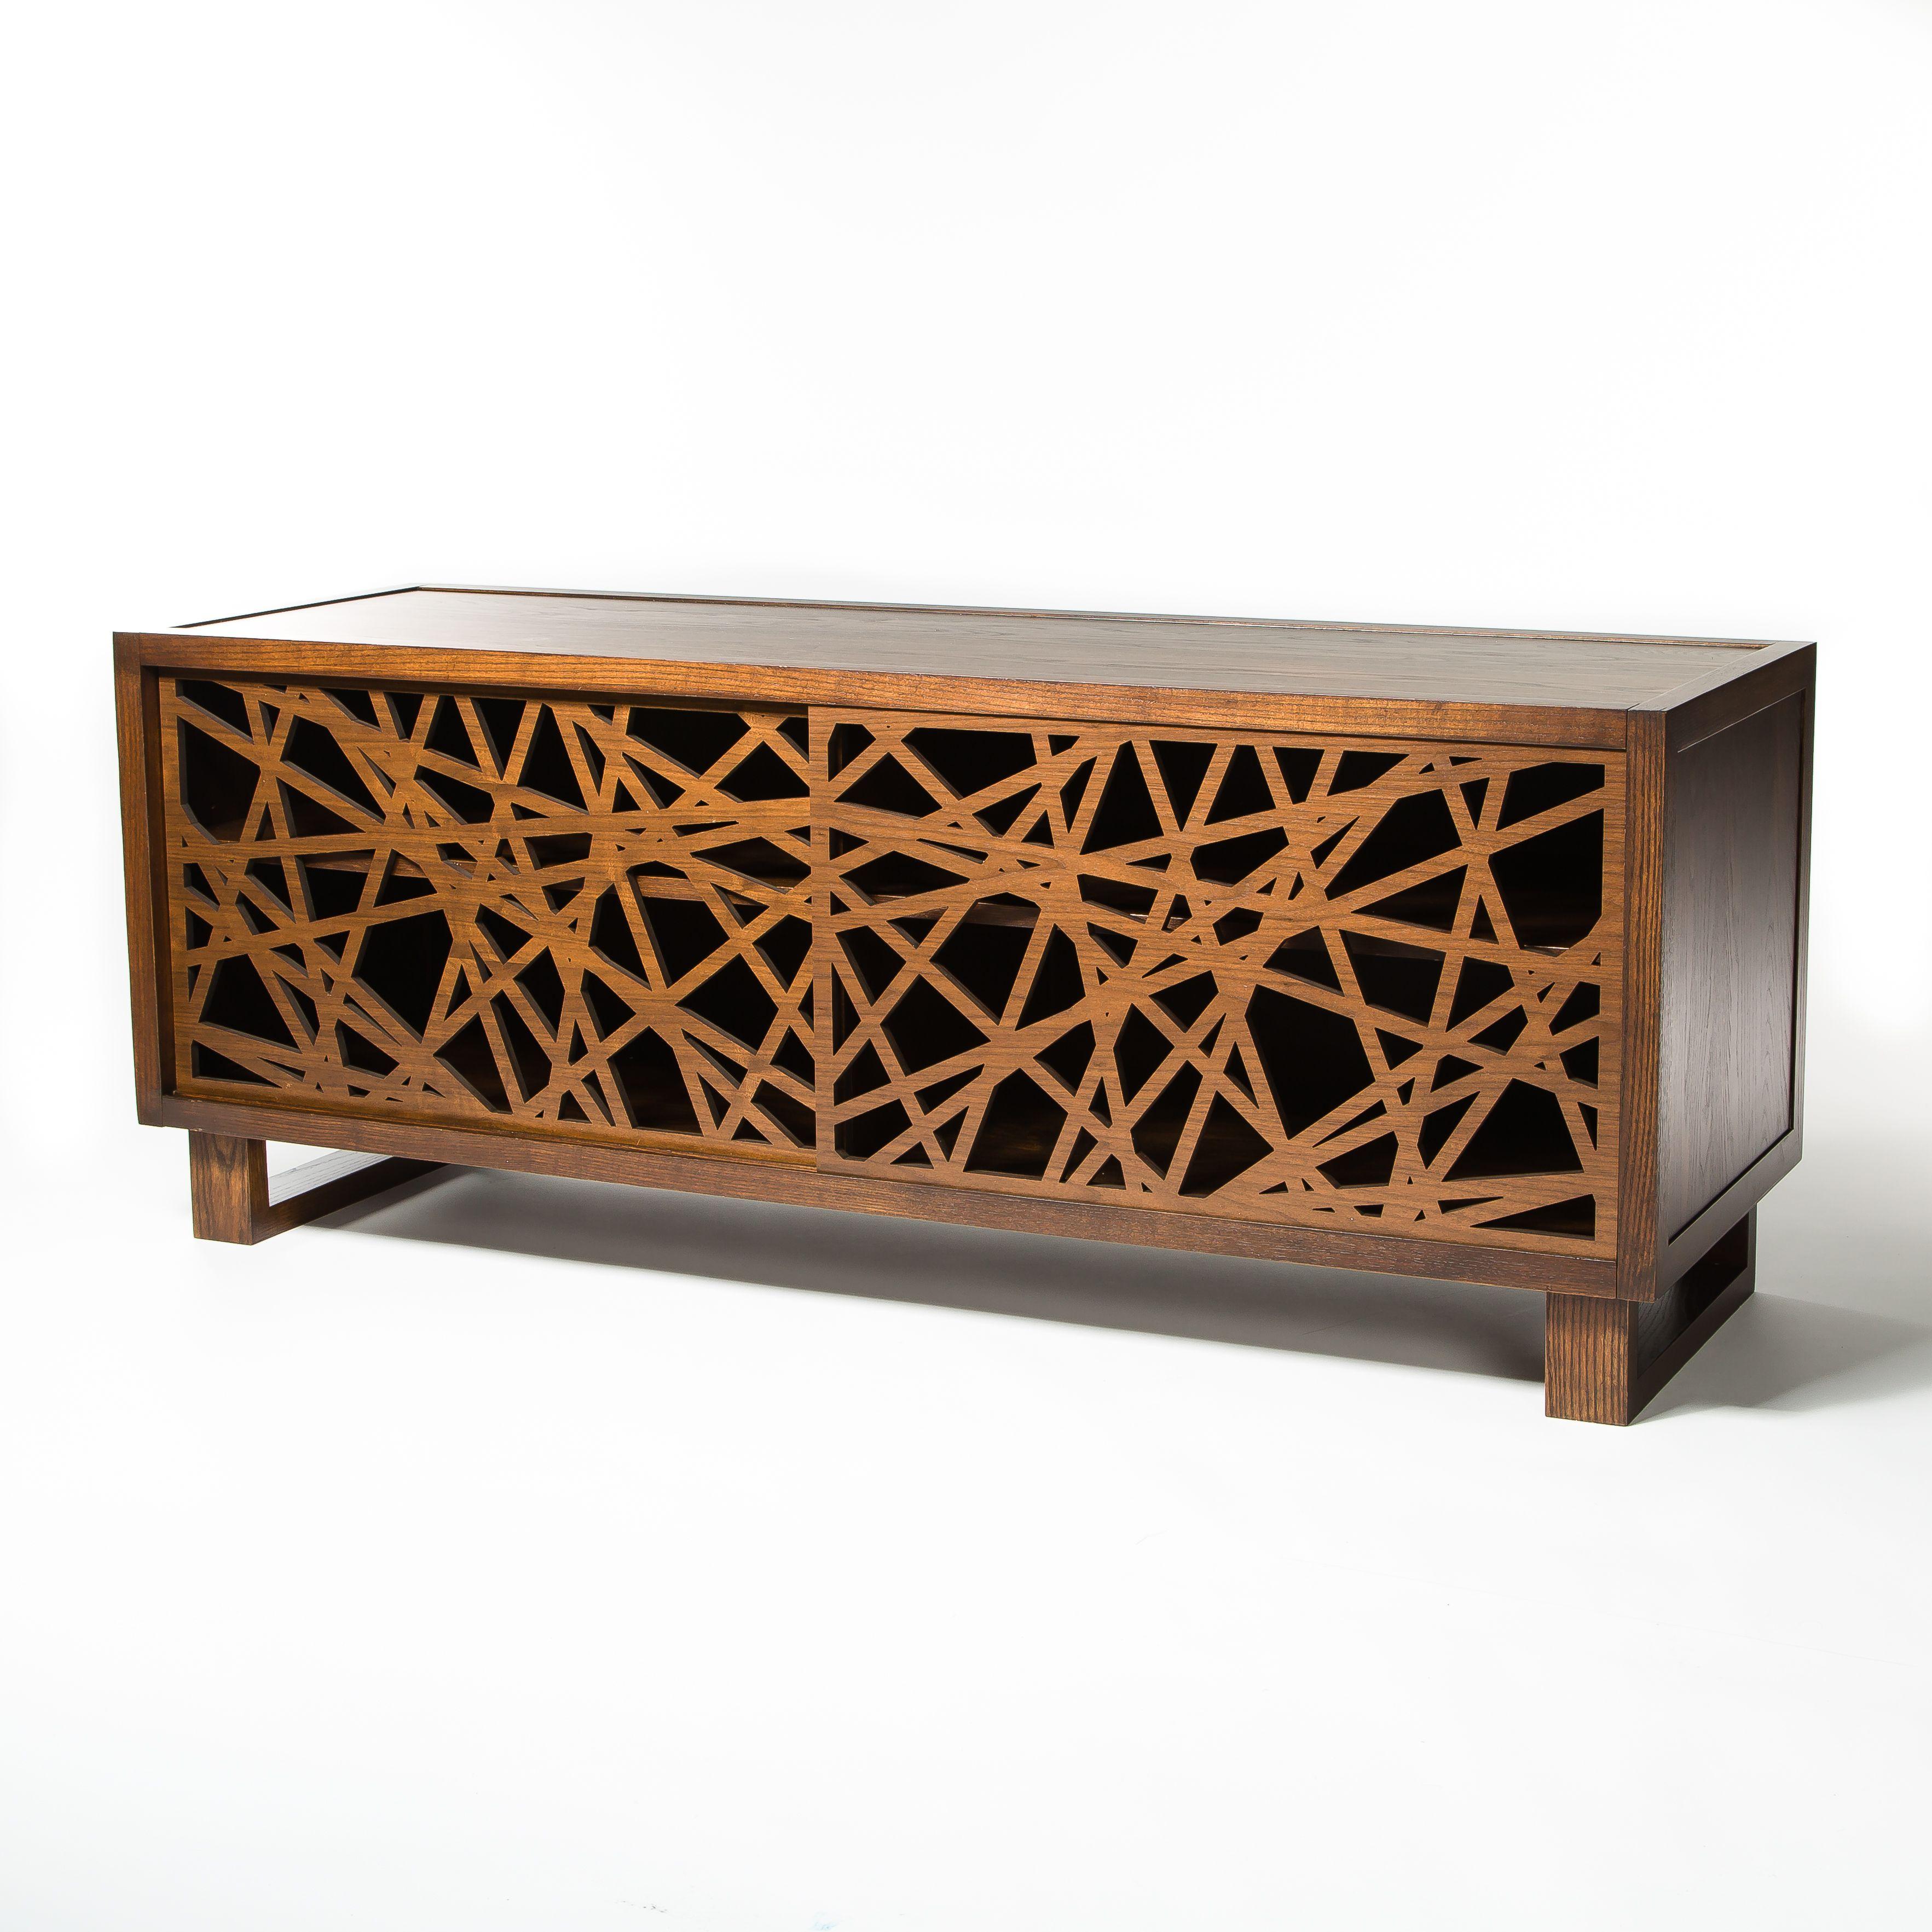 Modern credenza media cabinet featuring laser cut door design